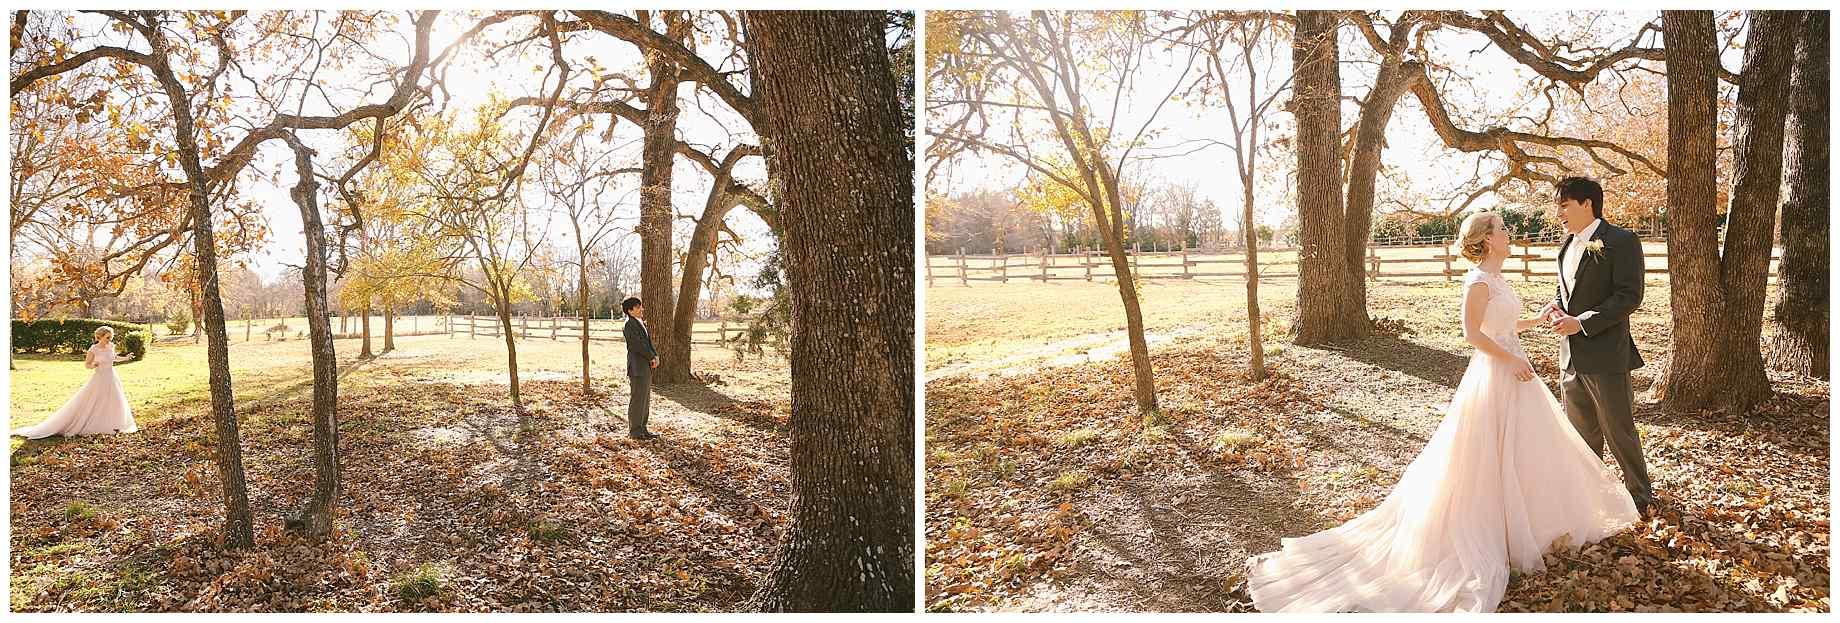 best-stone-oak-ranch-wedding-ever-00014